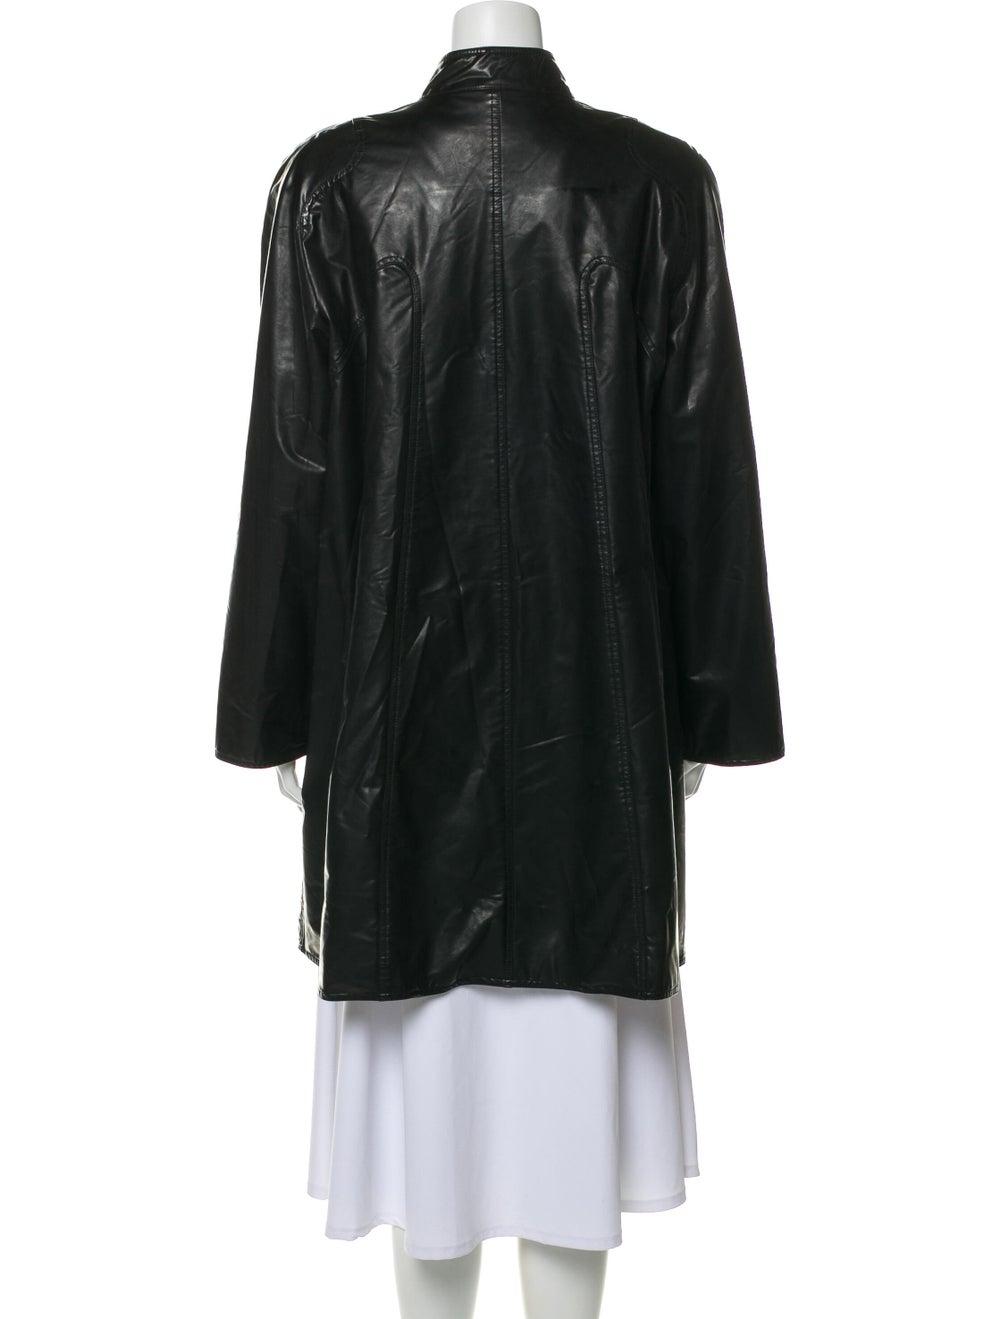 Thierry Mugler Evening Jacket Black - image 3